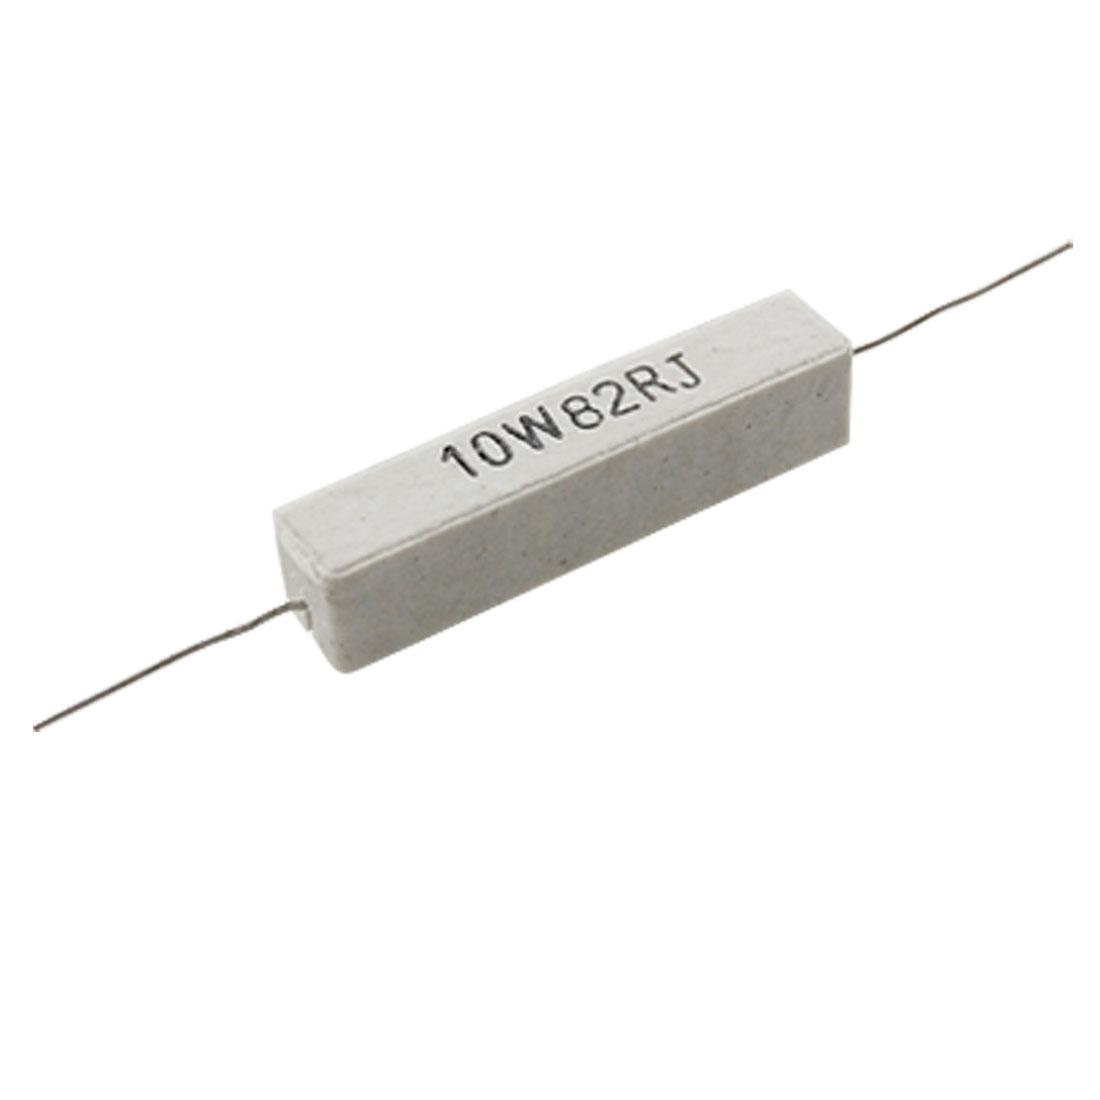 10pcs 10 Watt 82R Ceramic Cement Power Resistor 10W 82 ohm